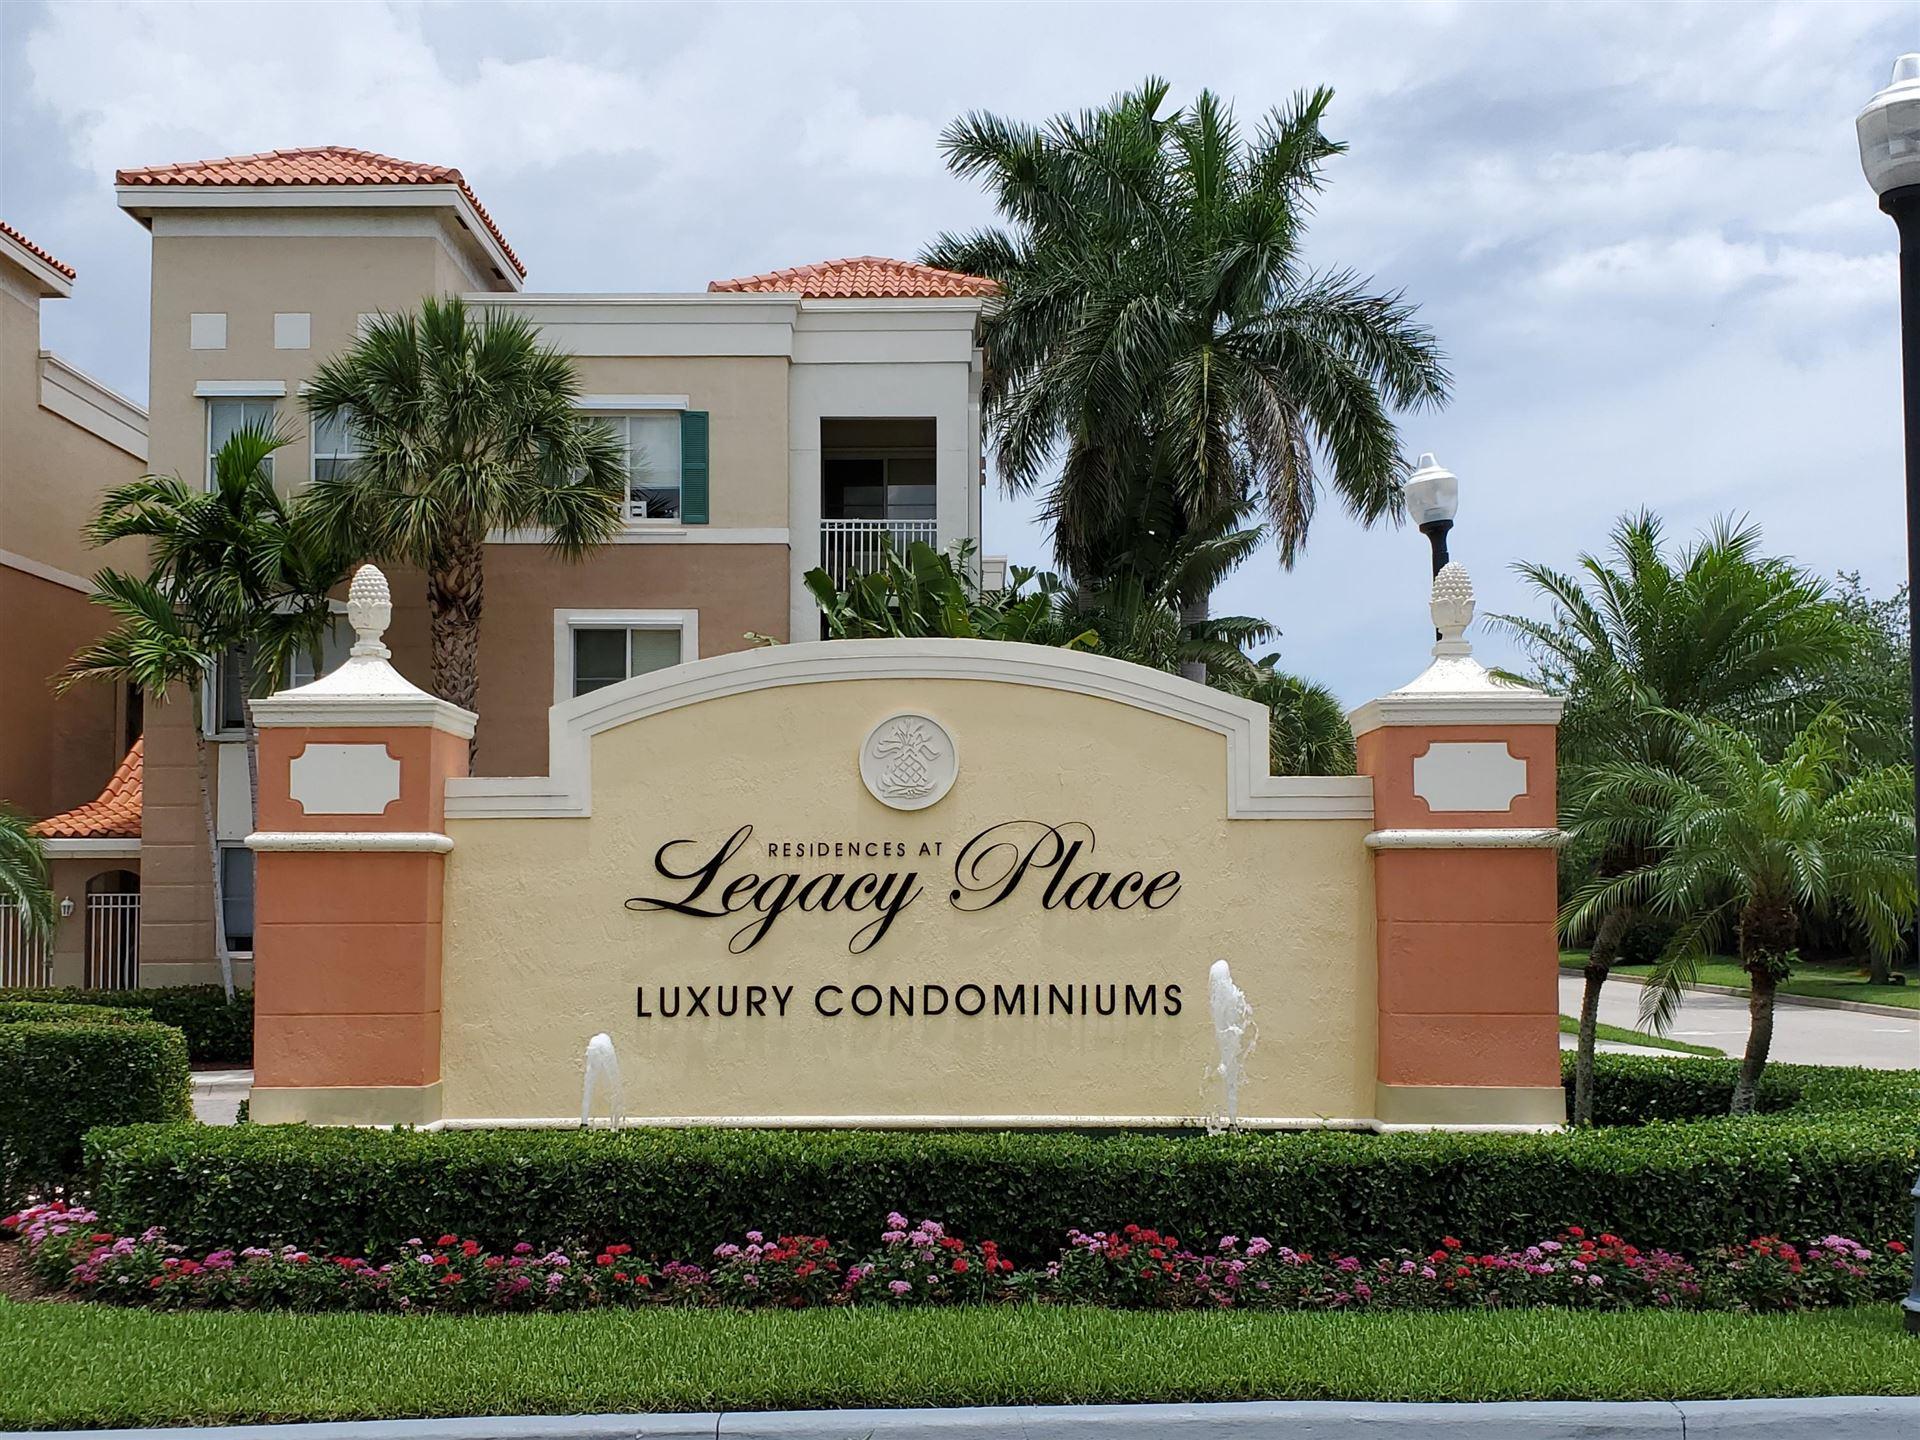 Photo of 11022 Legacy Drive #104, Palm Beach Gardens, FL 33410 (MLS # RX-10725002)